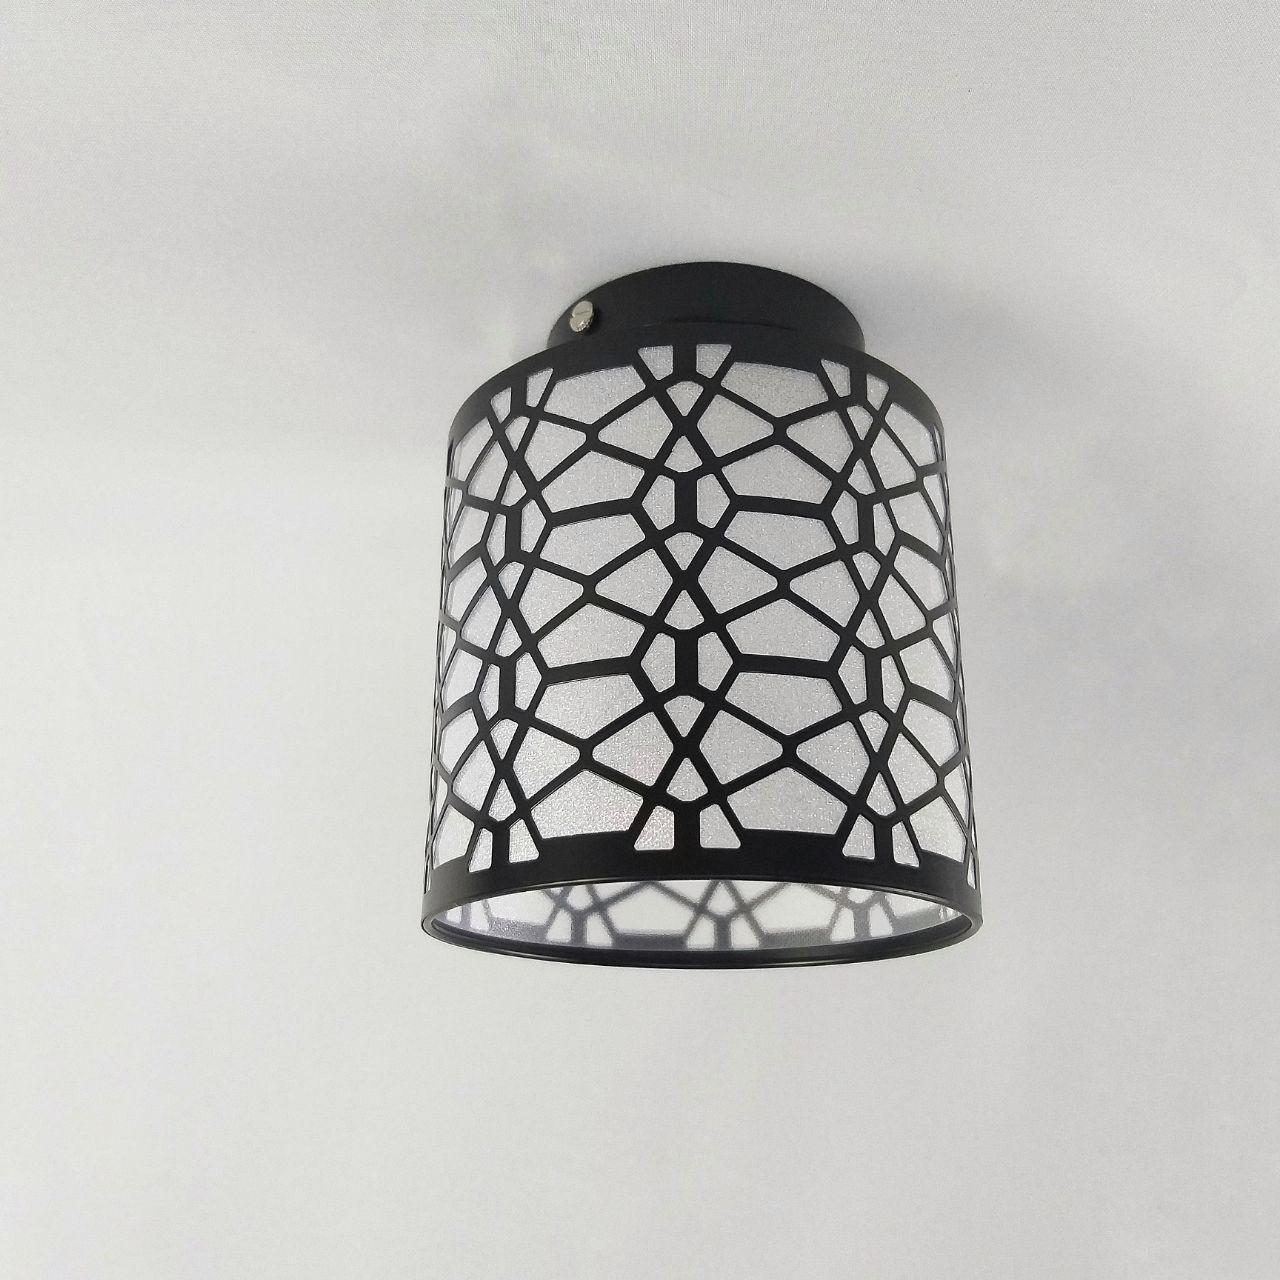 Люстра потолочная на 1 лампу в узор с блестками черная 29-T0002 BK